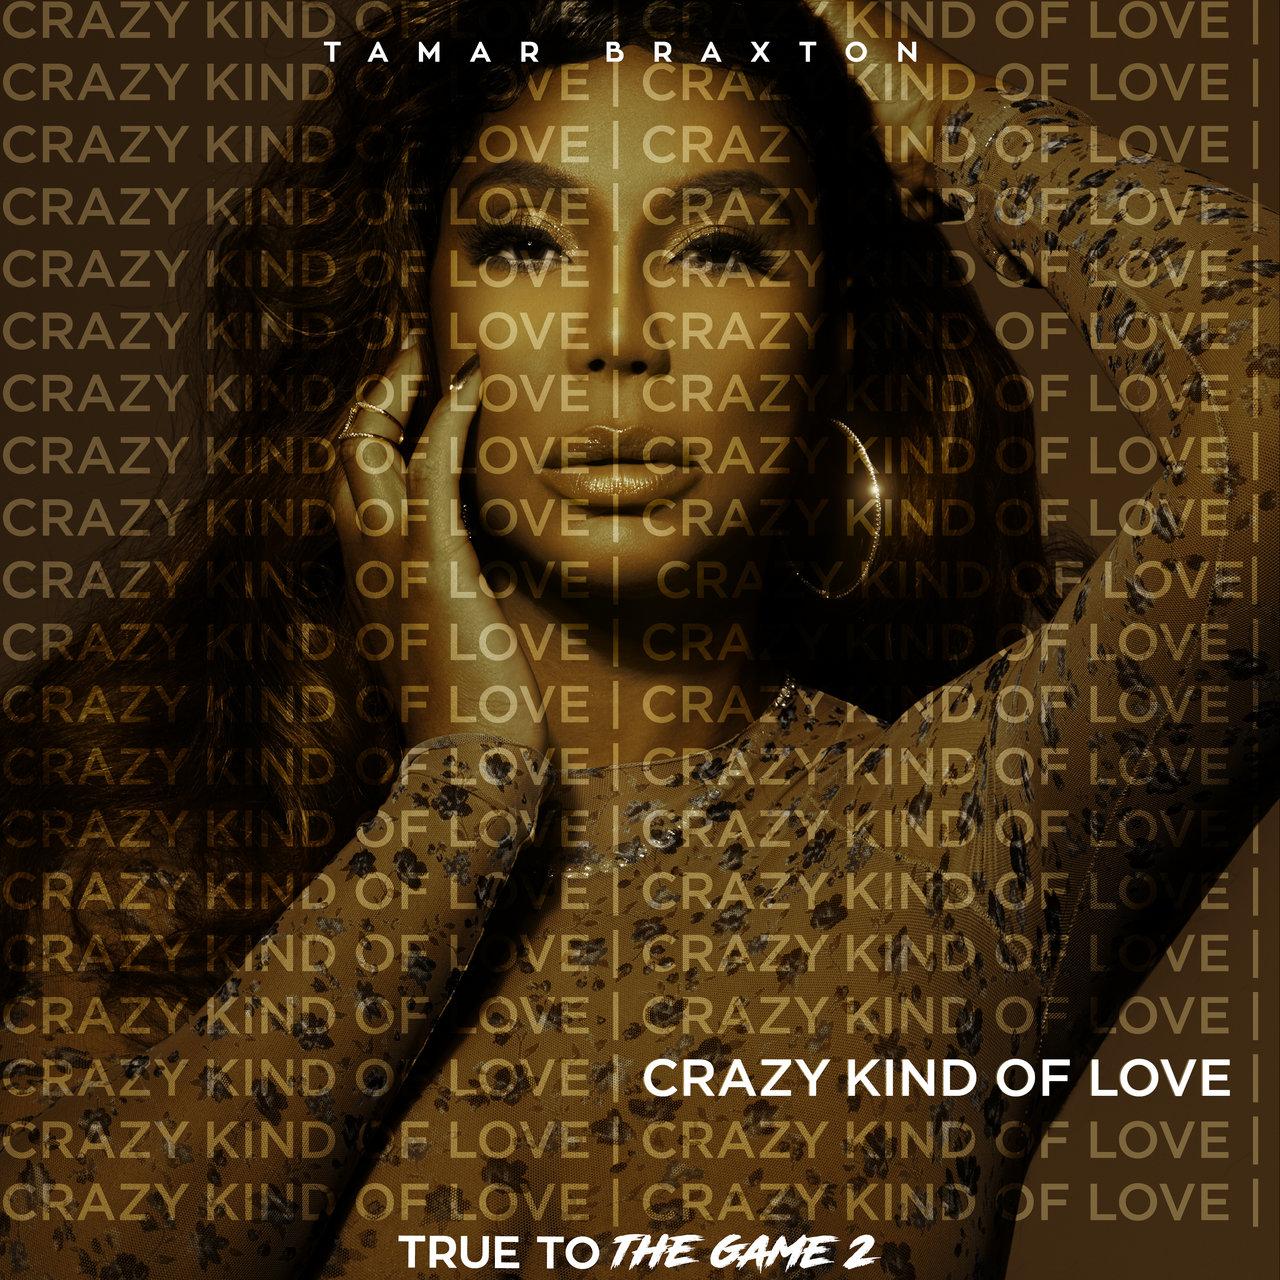 Tamar Braxton - Crazy Kind of Love